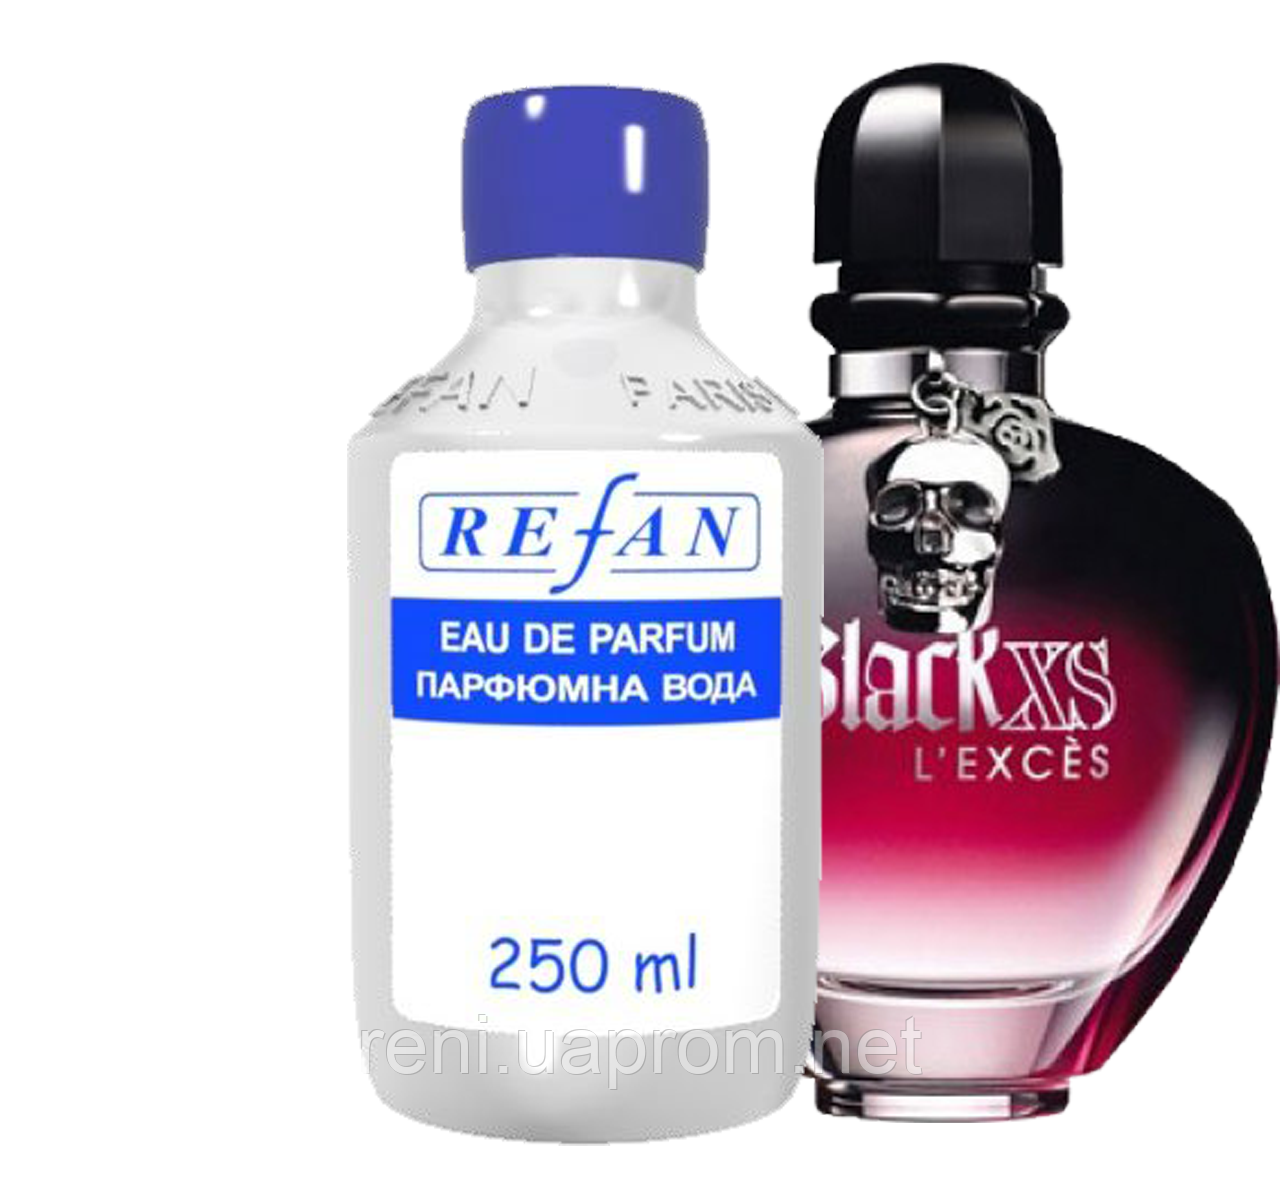 Refan 011 версия аромата Black Xs Lexces For Her Paco Rabanne оптом в харків с доставкой по украине